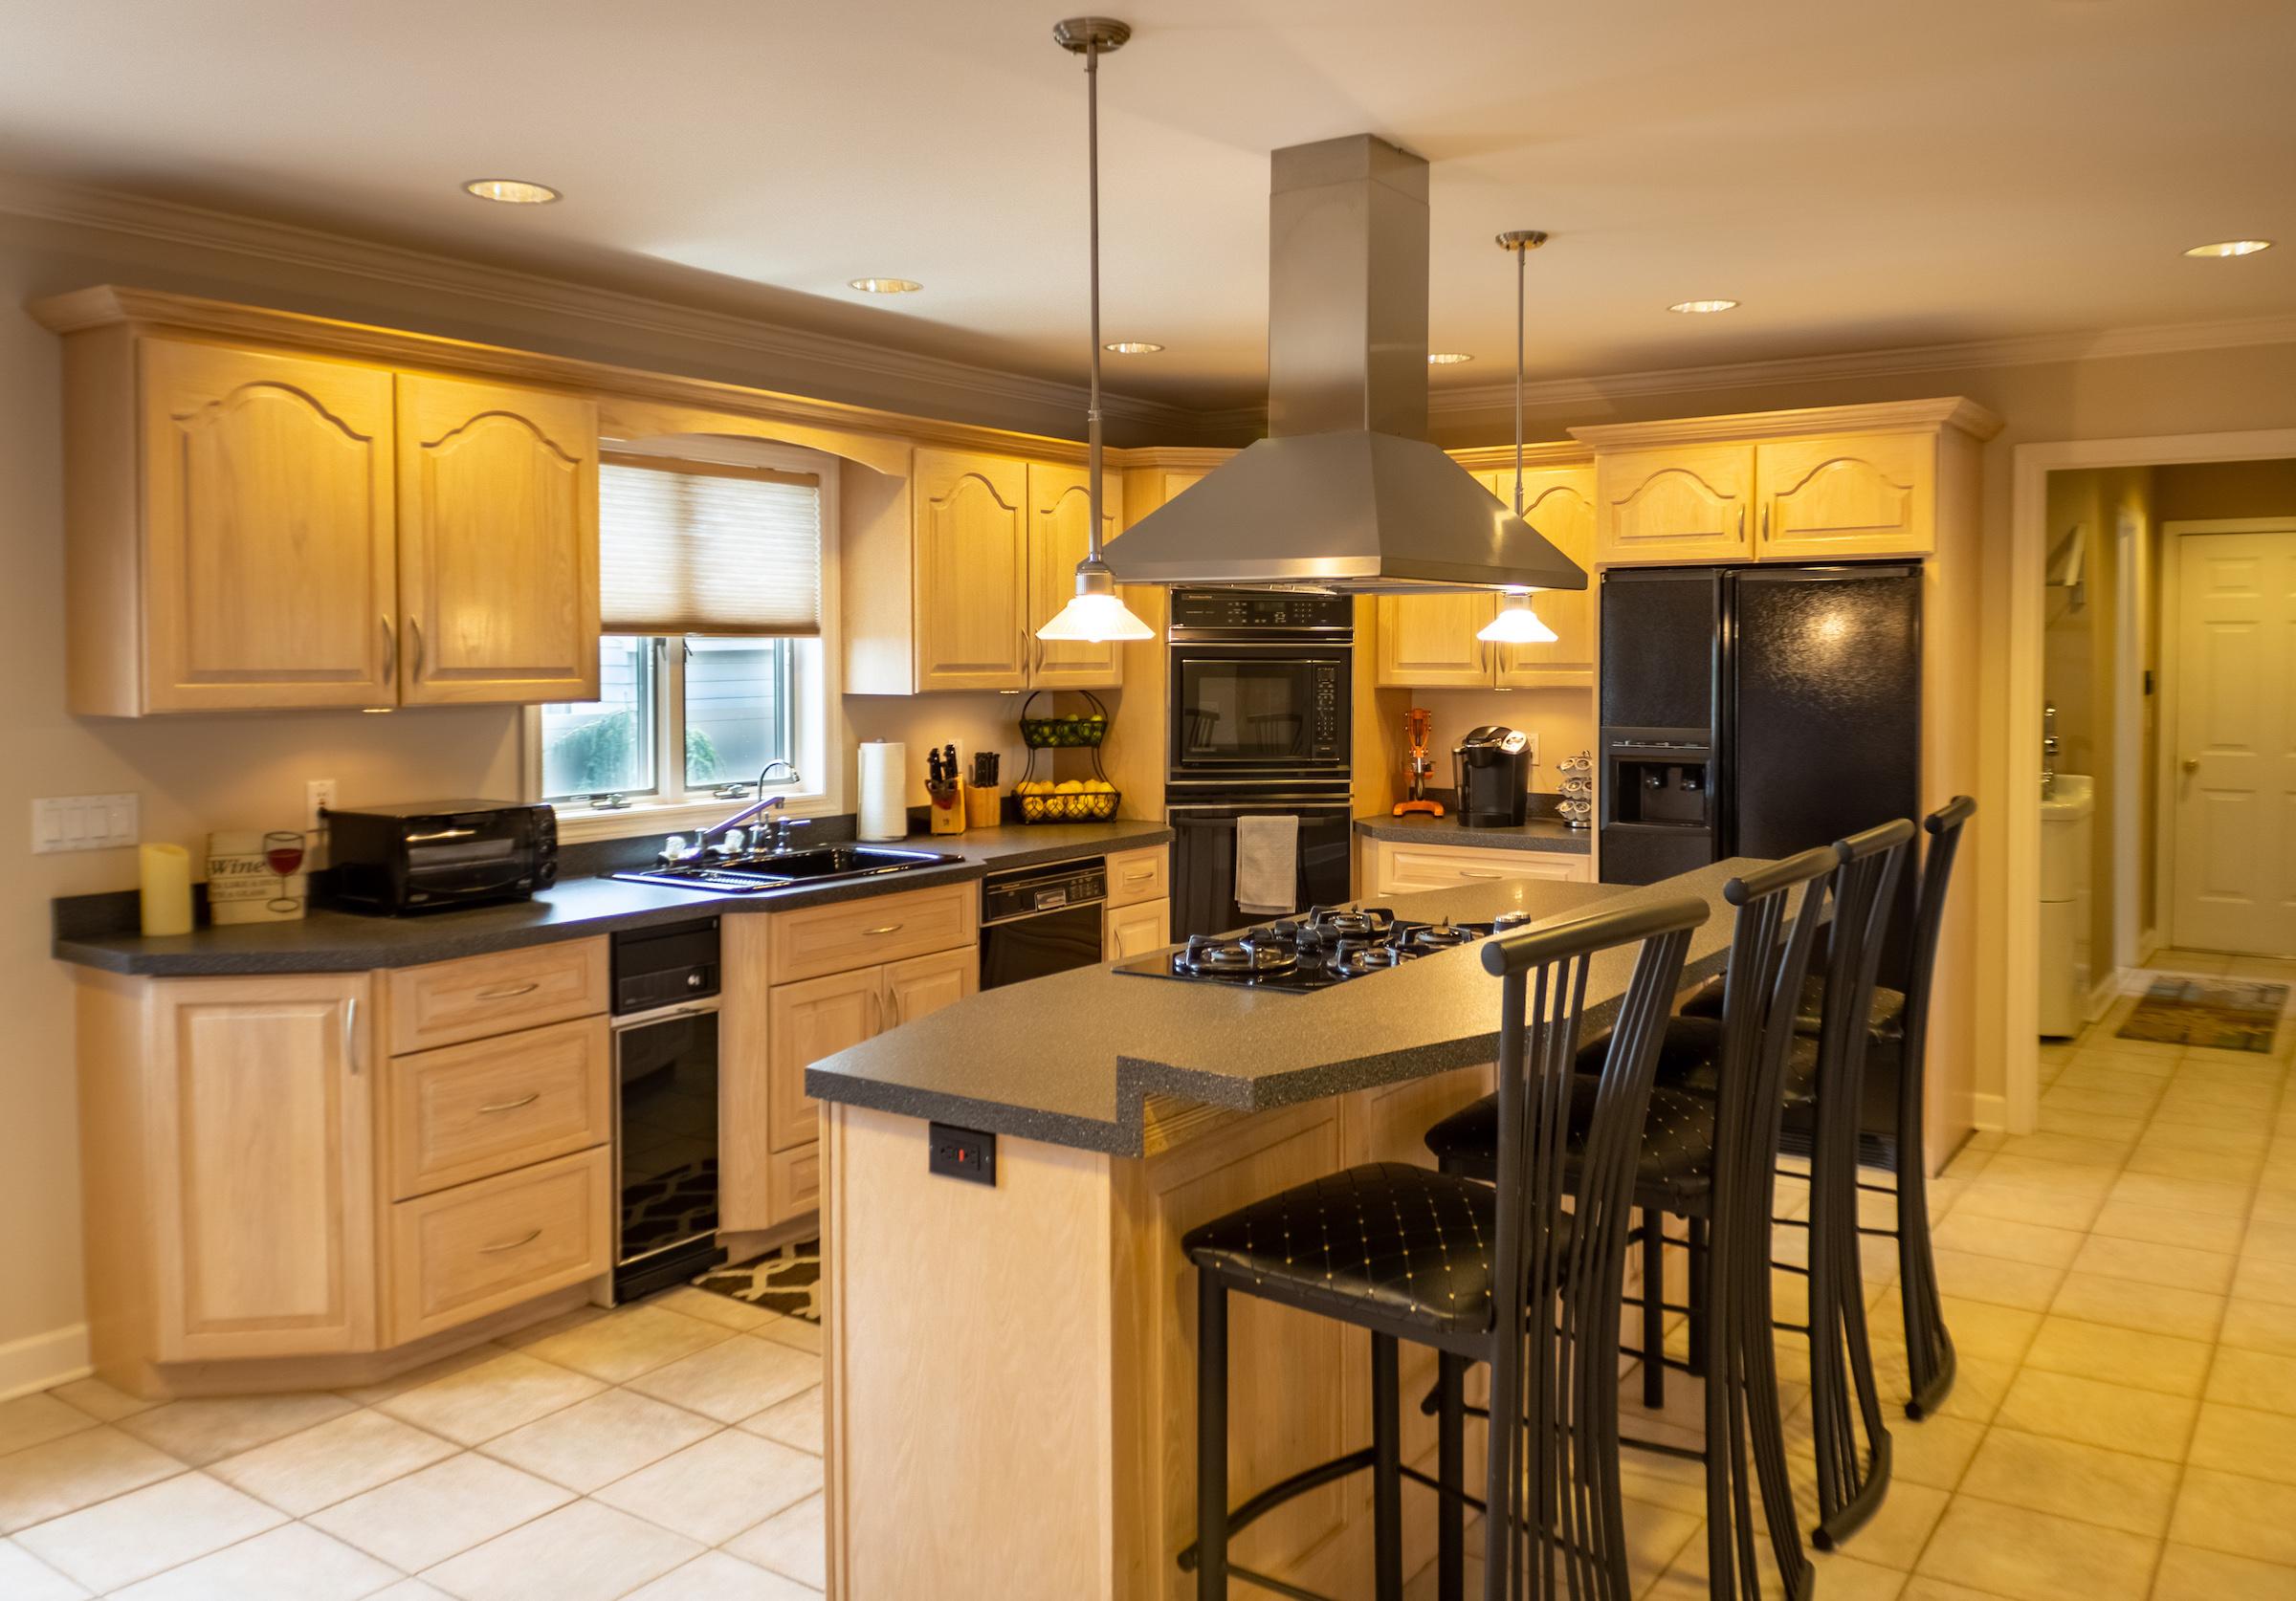 kitchenmiddle2.jpg